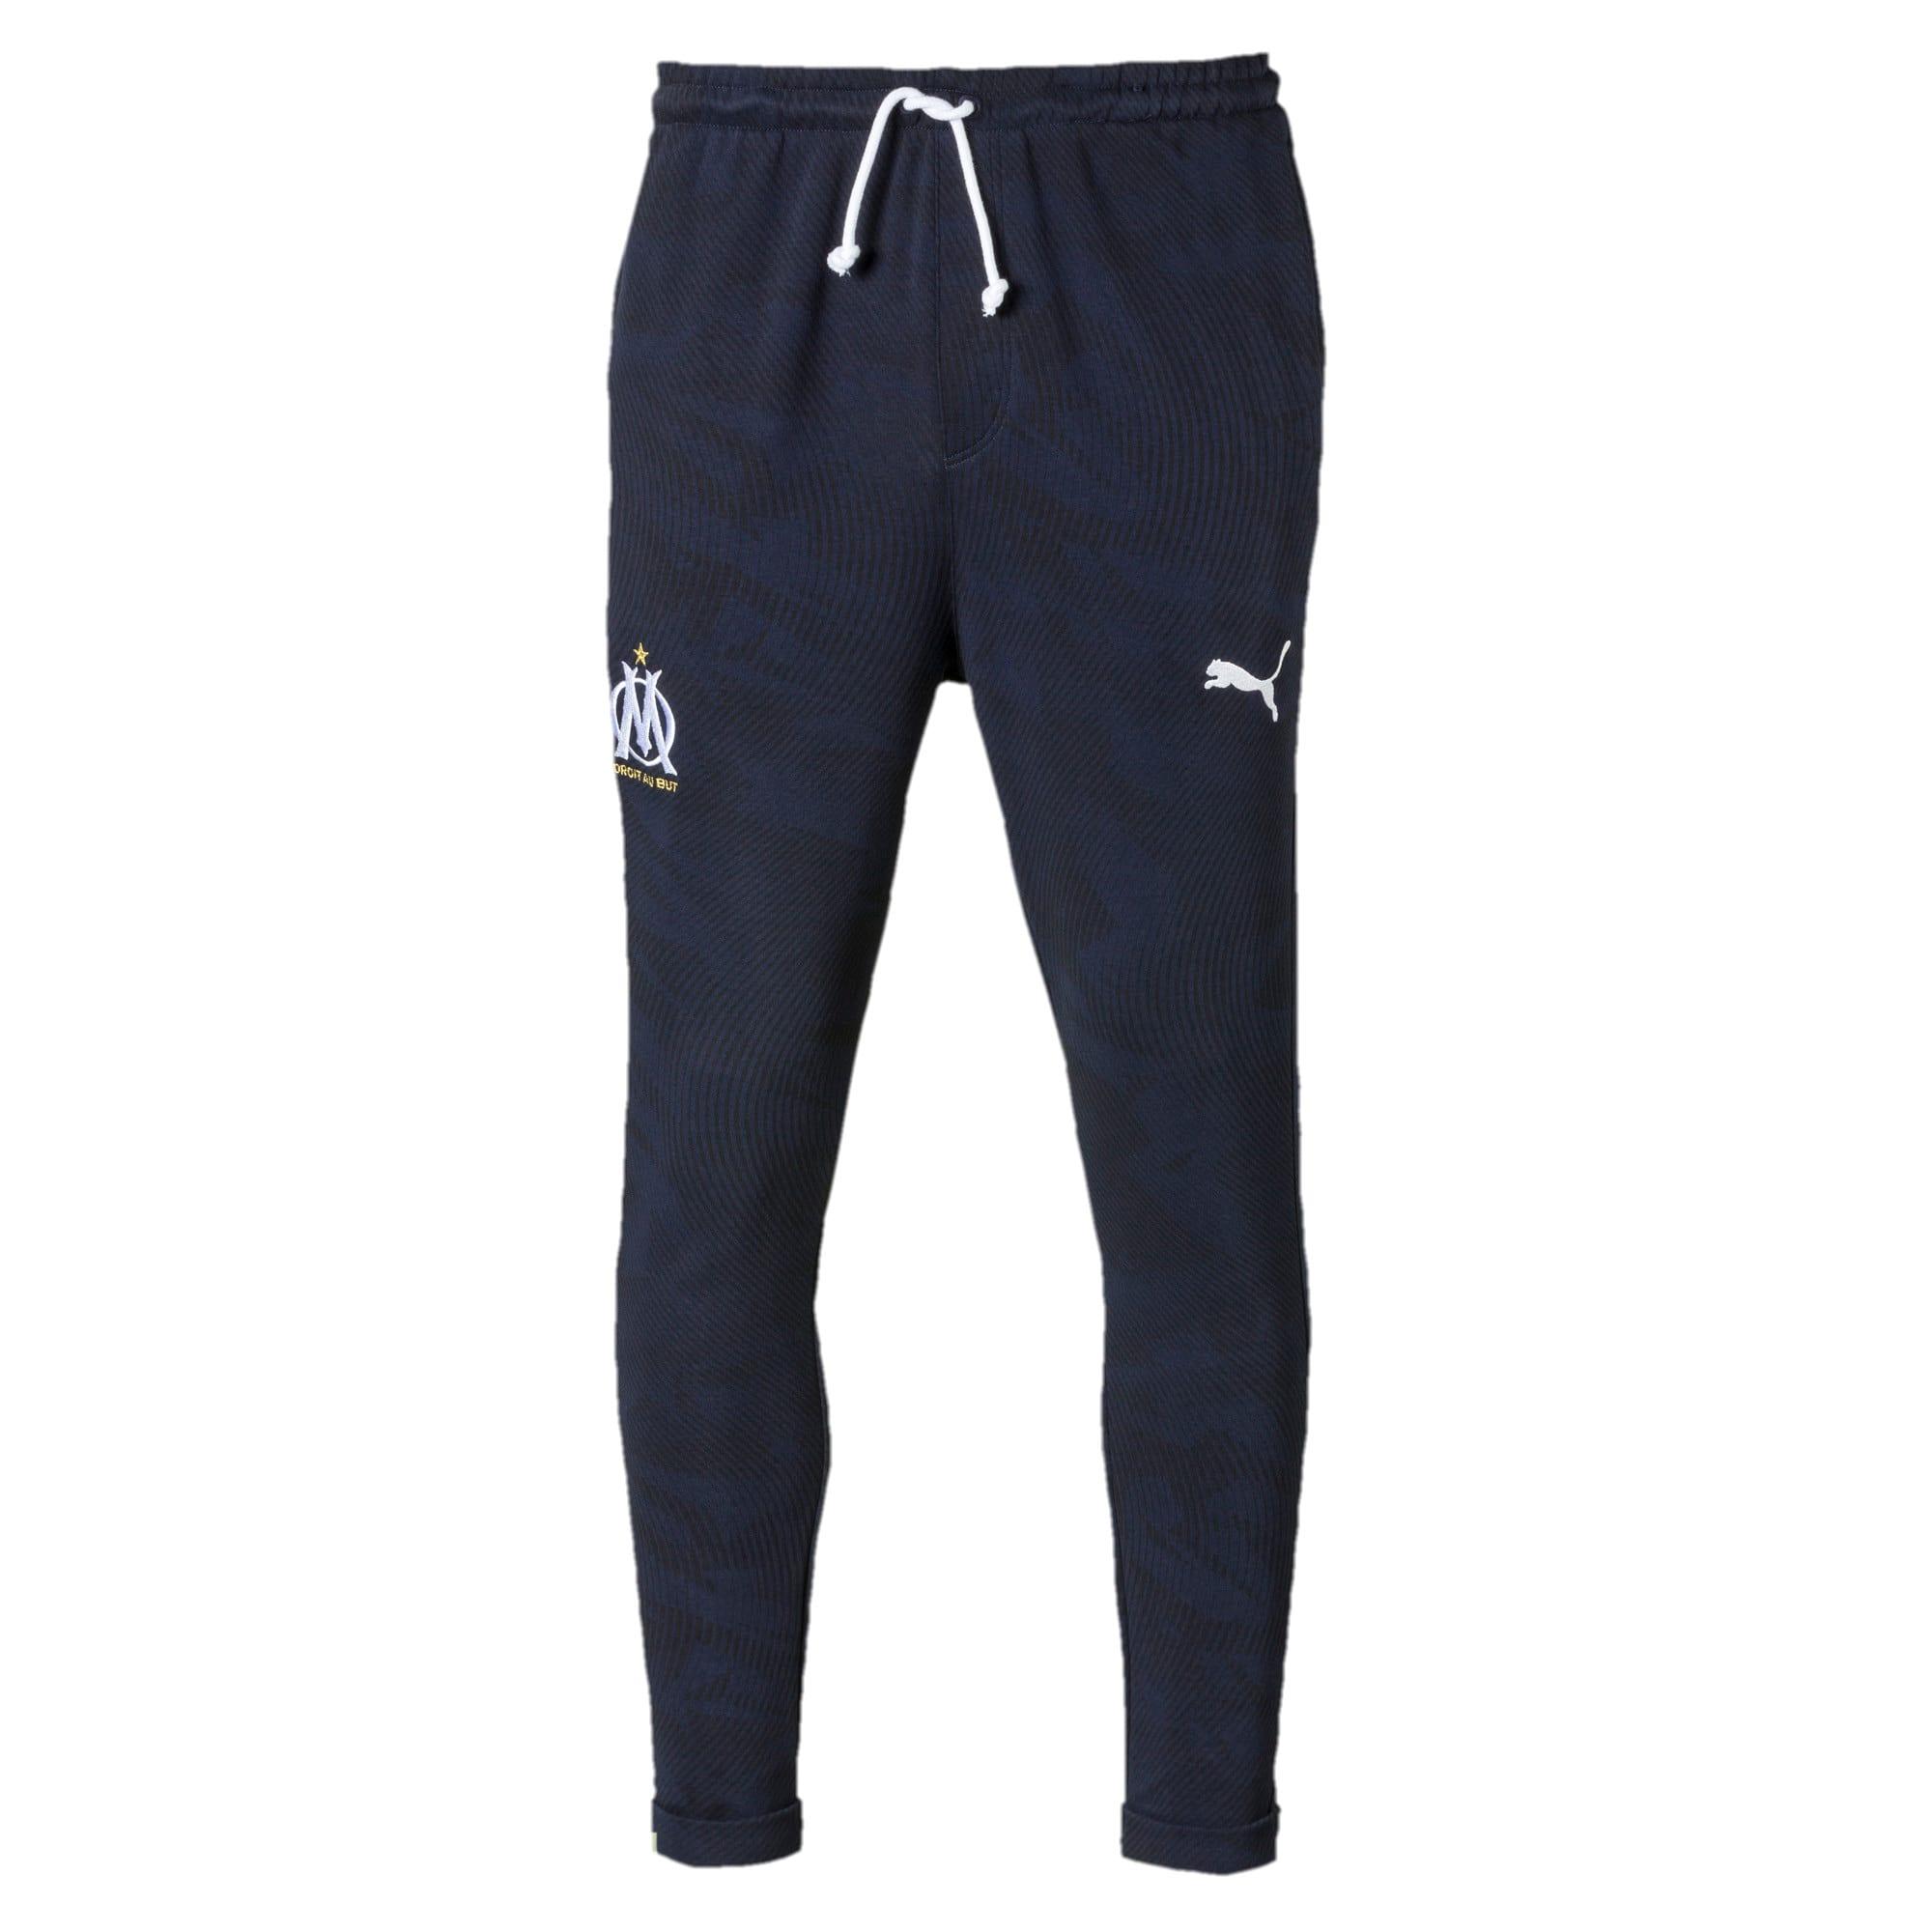 Thumbnail 4 of Olympique de Marseille Casuals Men's Sweatpants, Peacoat, medium